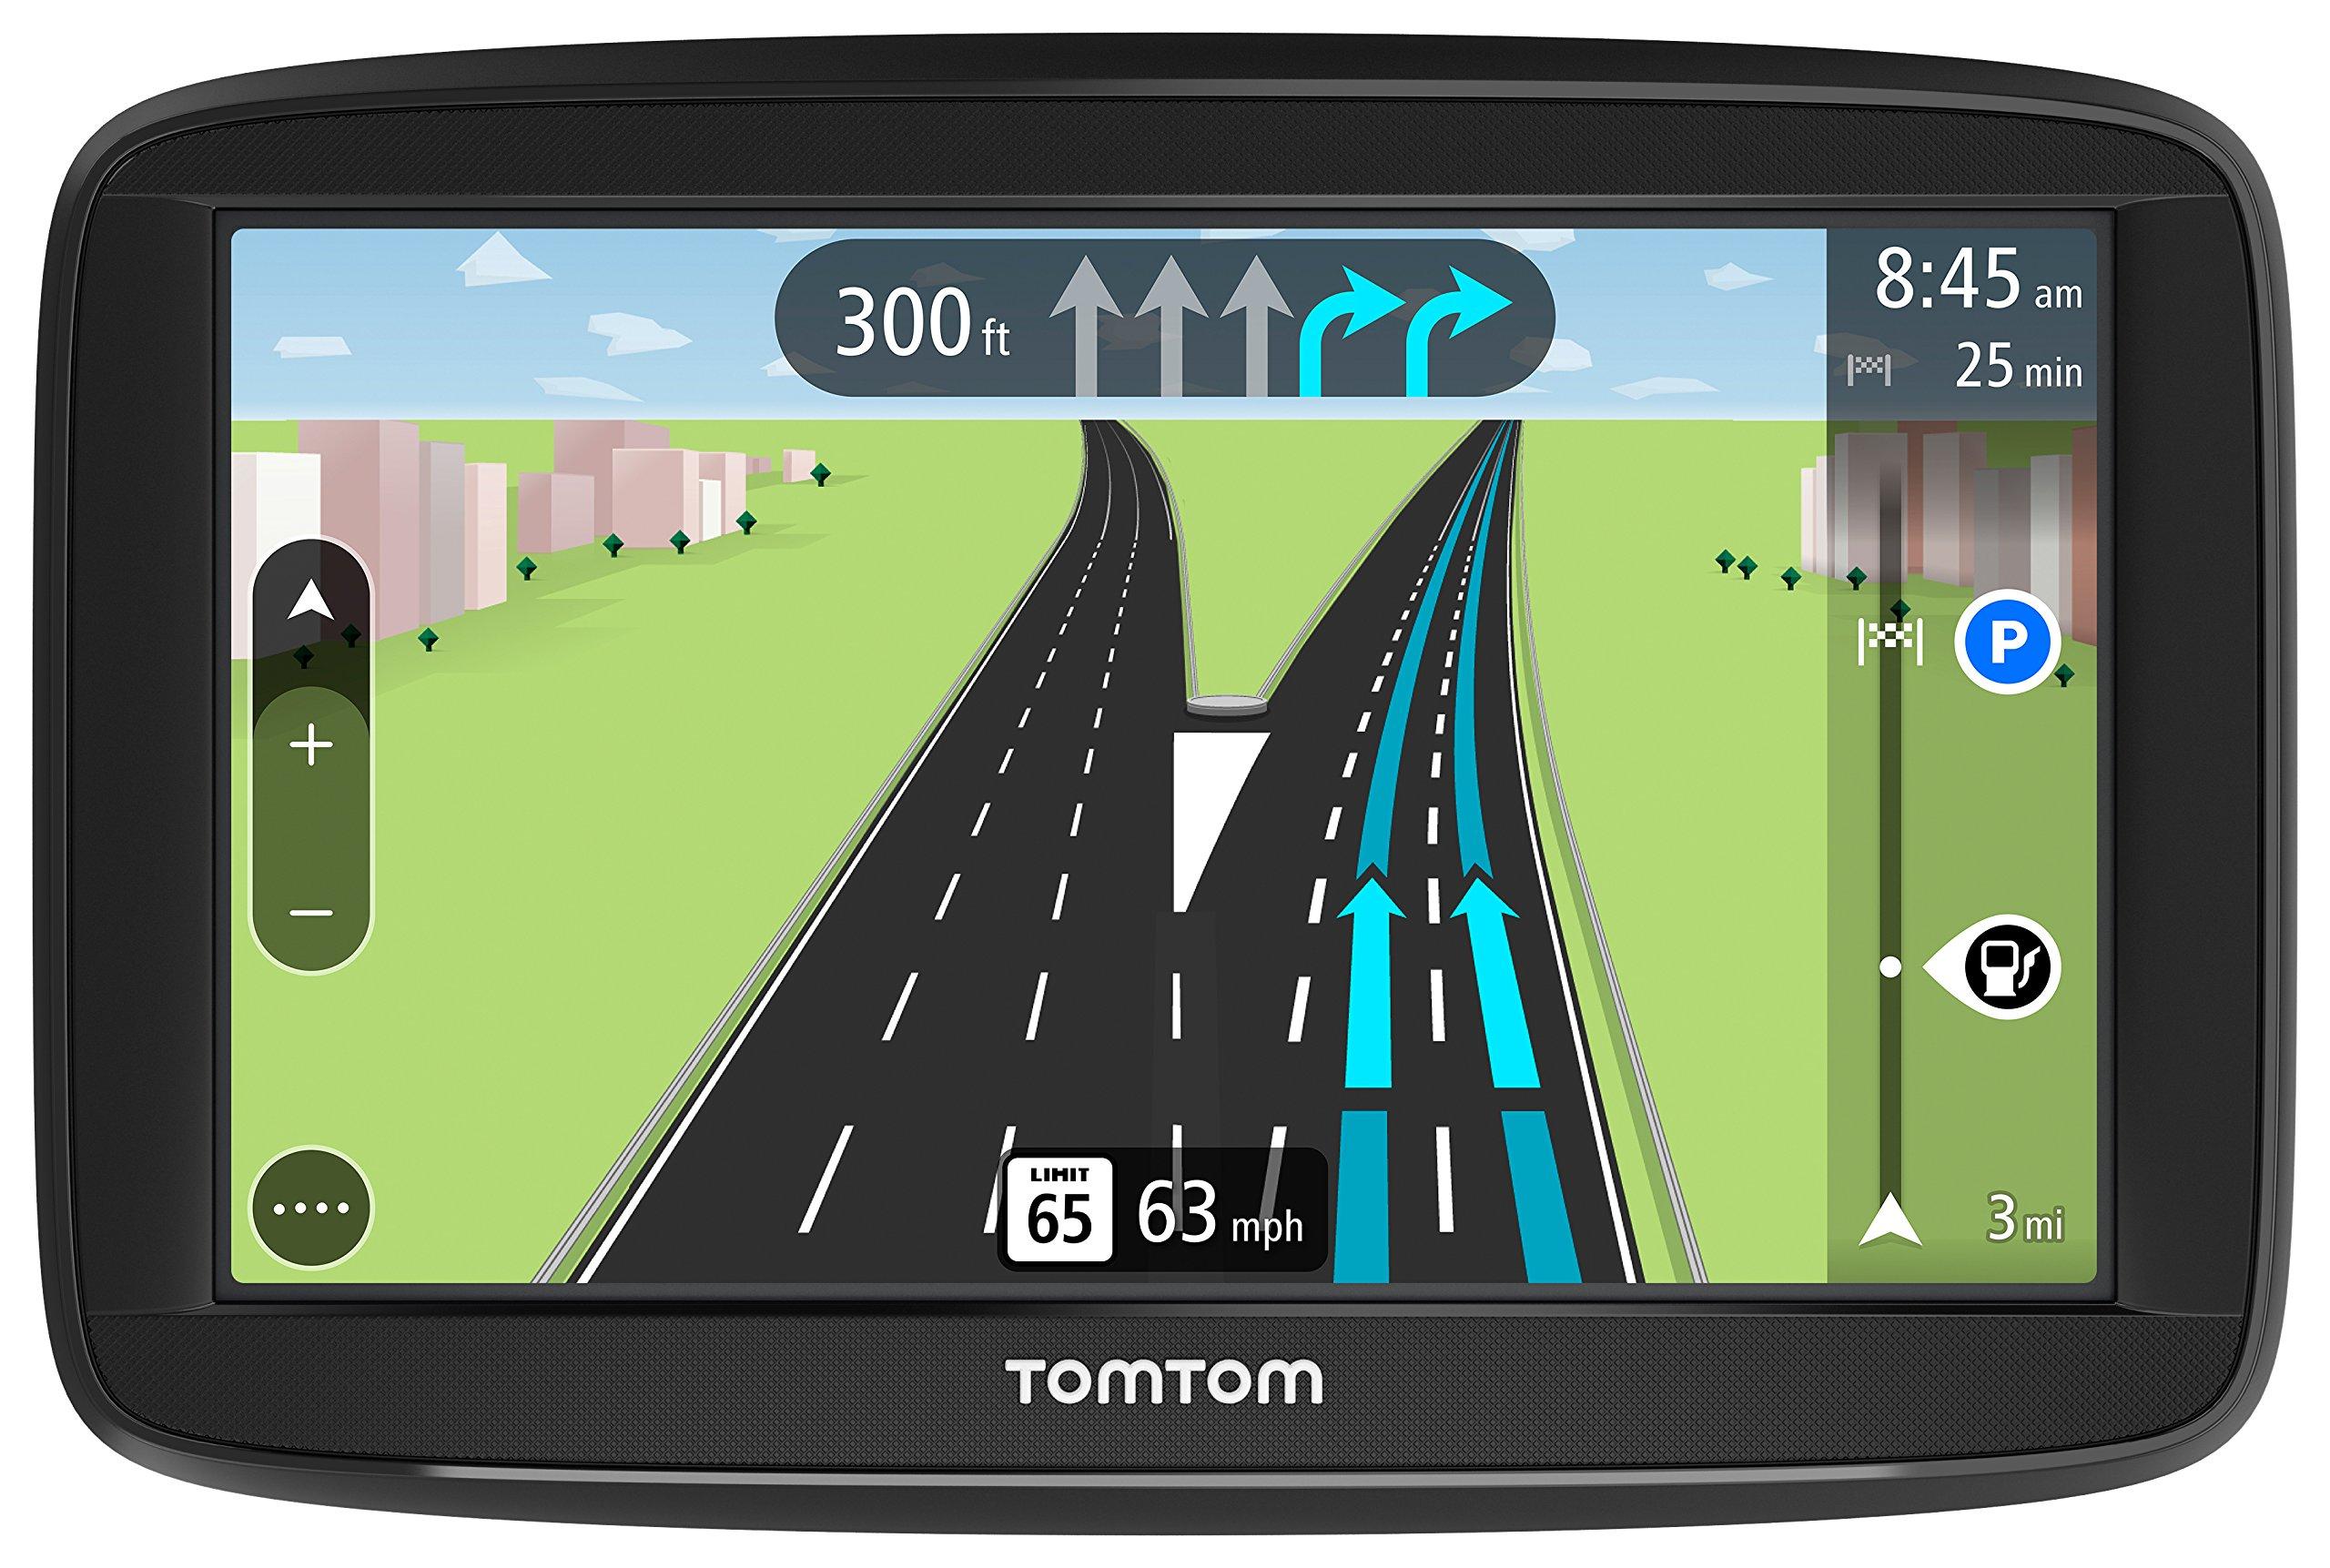 TomTom Navigation Lifetime Advanced Directions